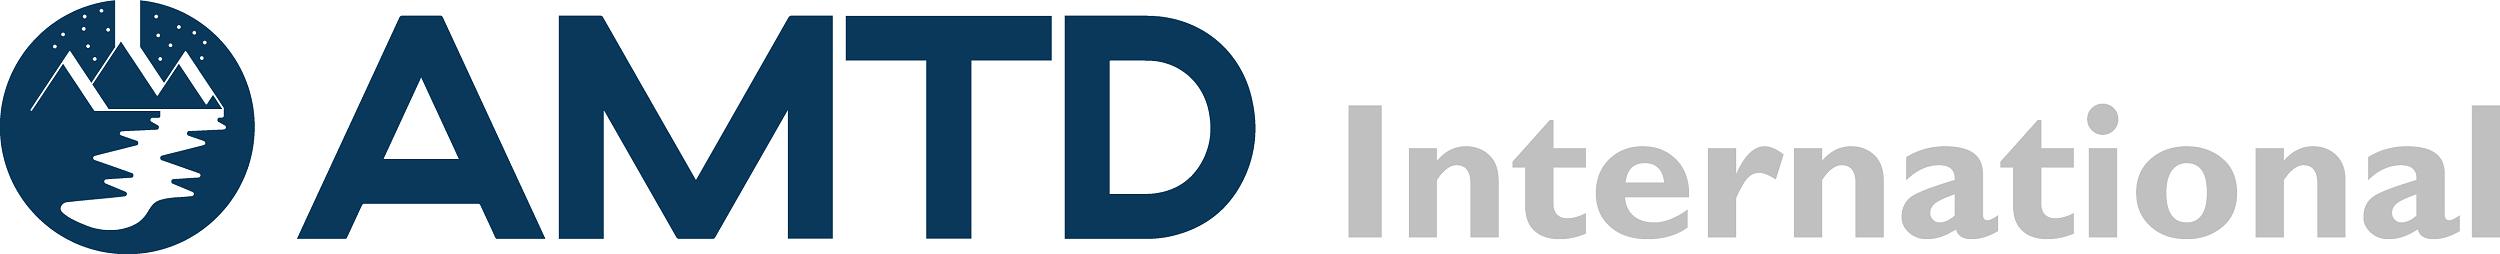 HKIB logo